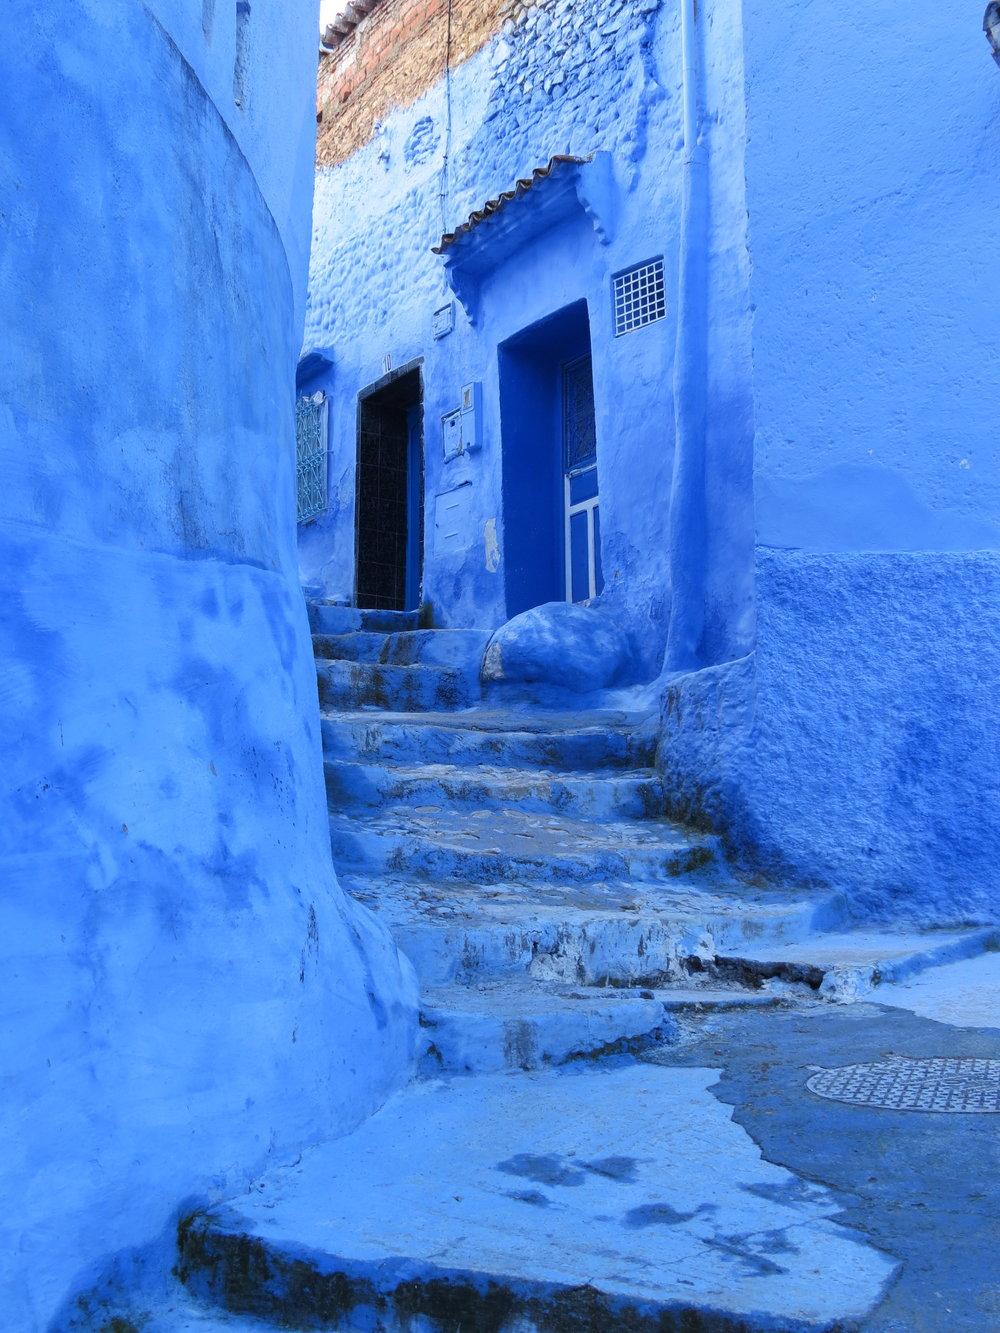 Morocco's blue city, Chefchaouen.